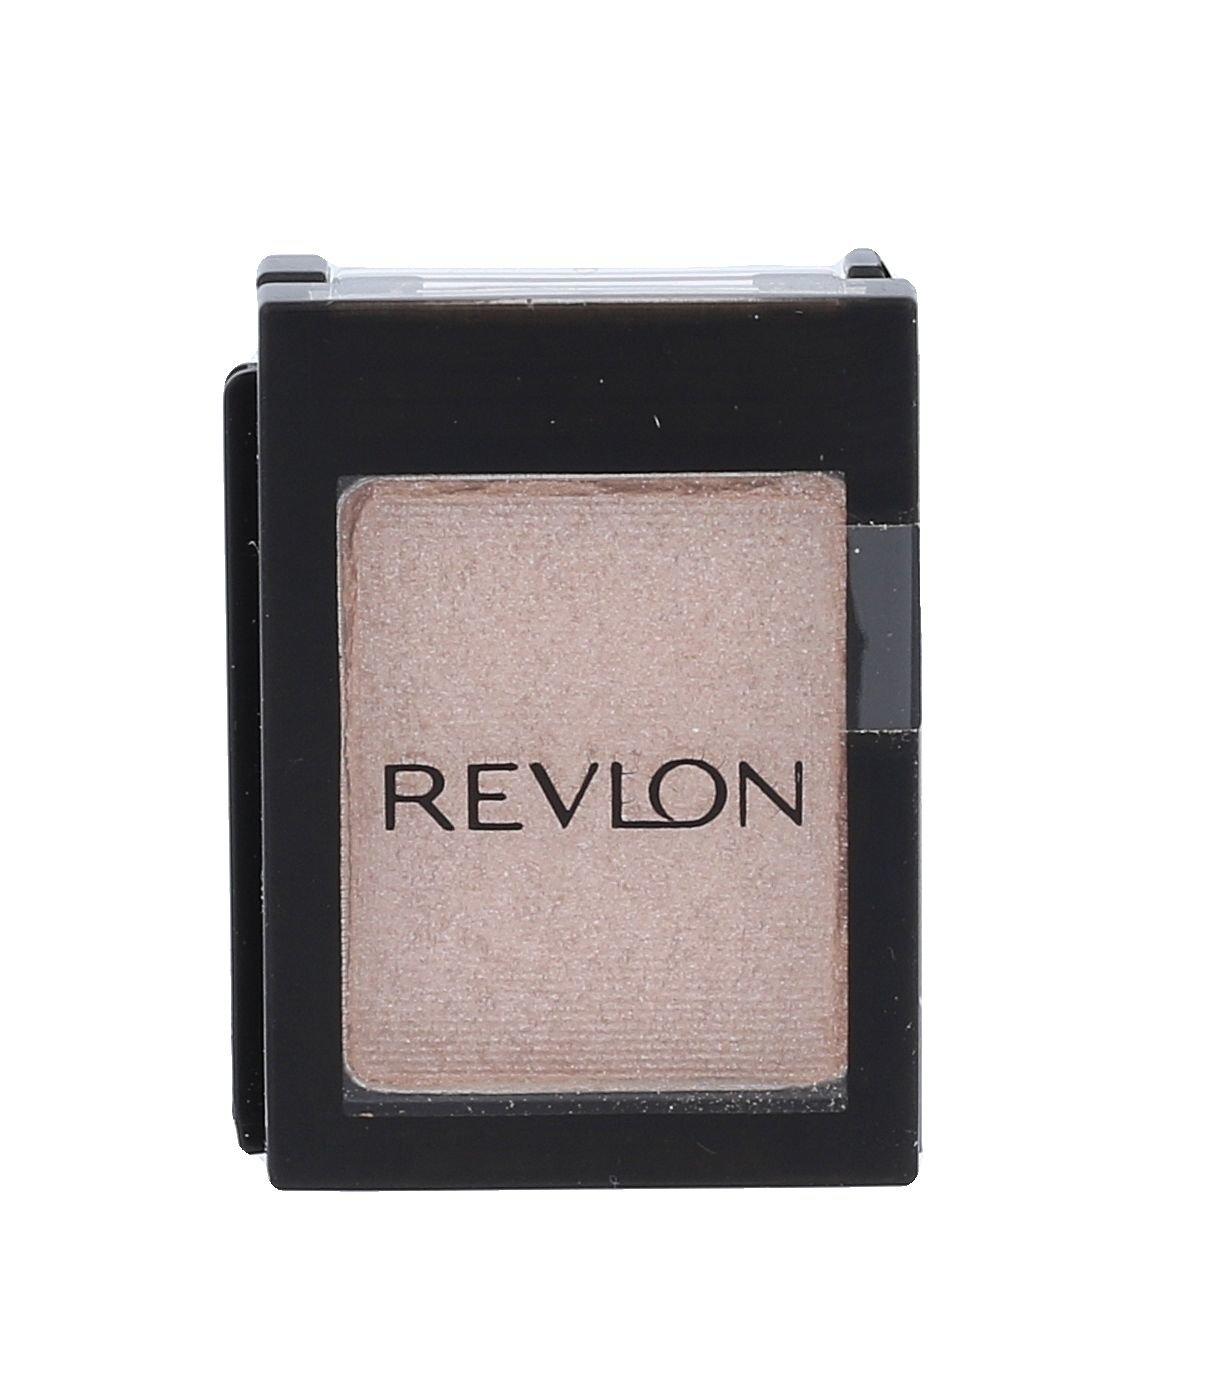 Revlon Colorstay Cosmetic 1,4ml Sand